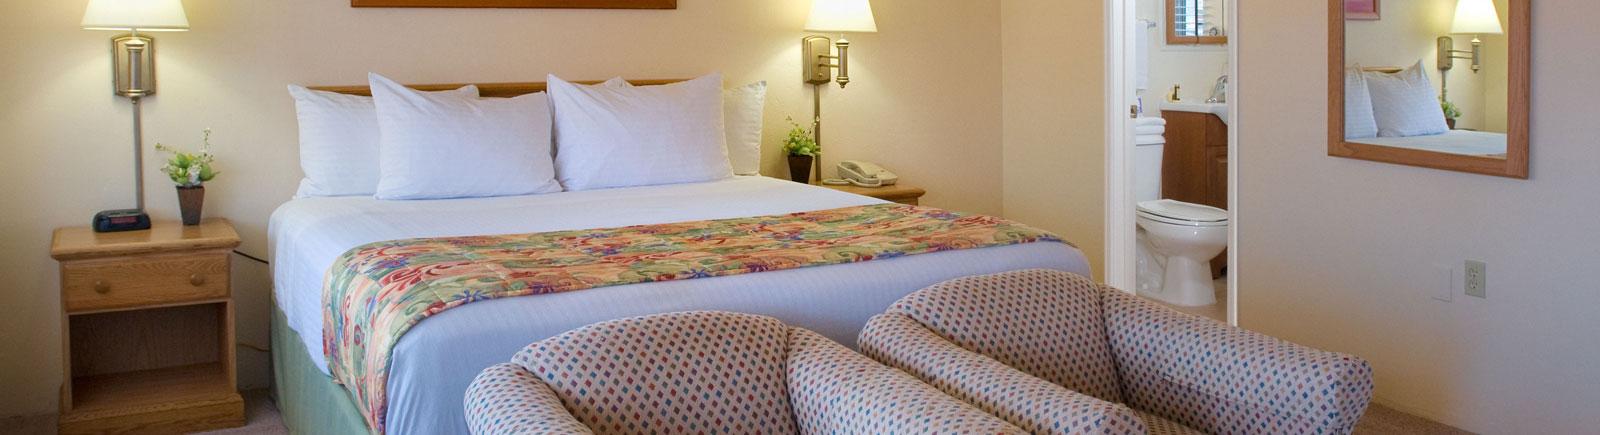 San Diego California Hotel Deals